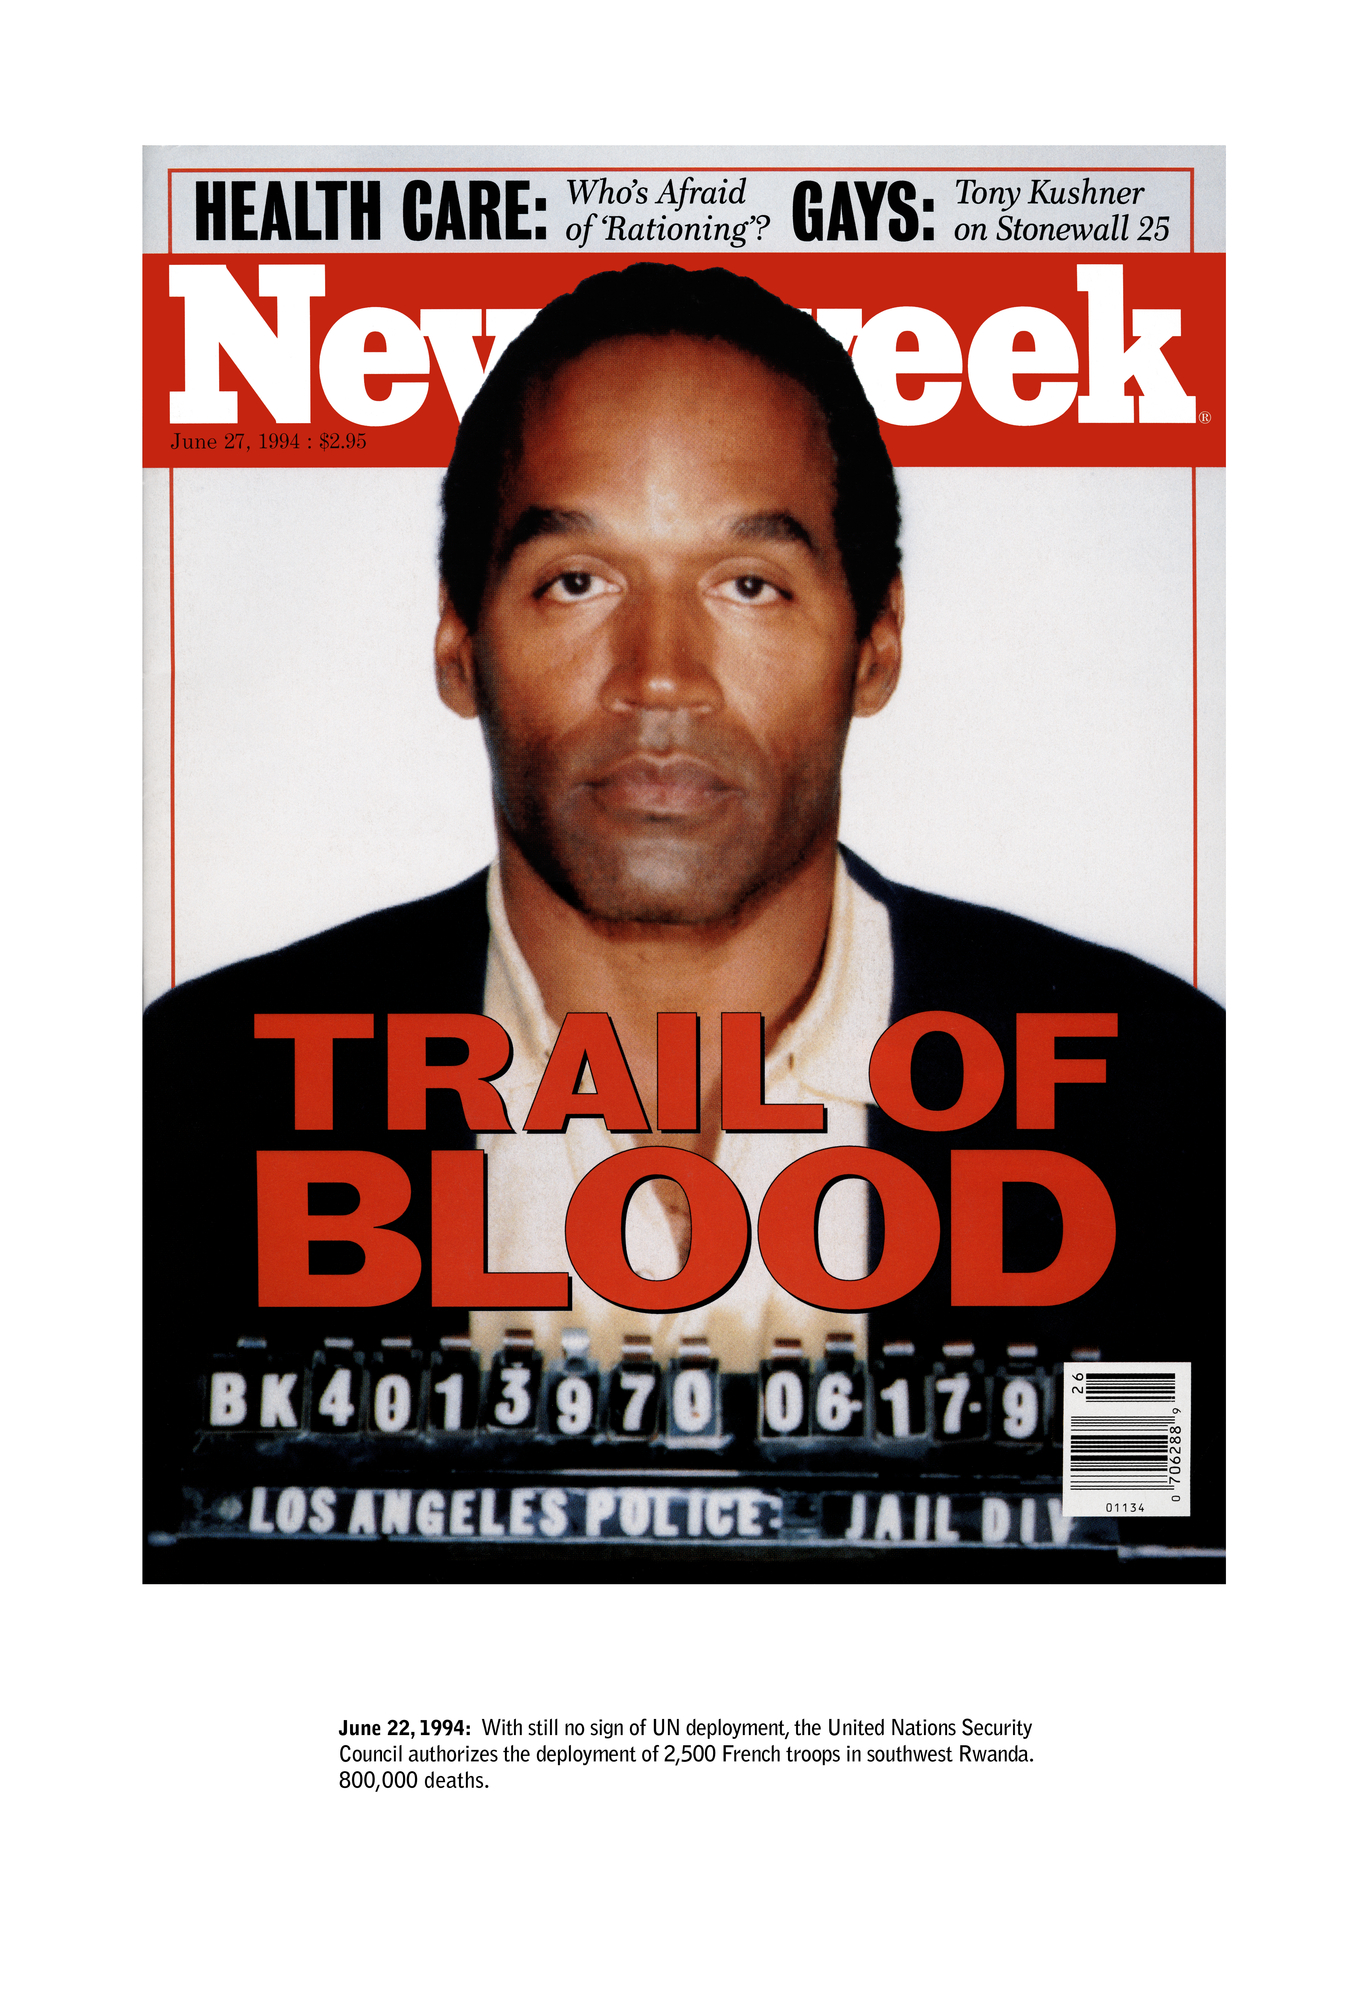 Untitled (Newsweek) (detail), 1995